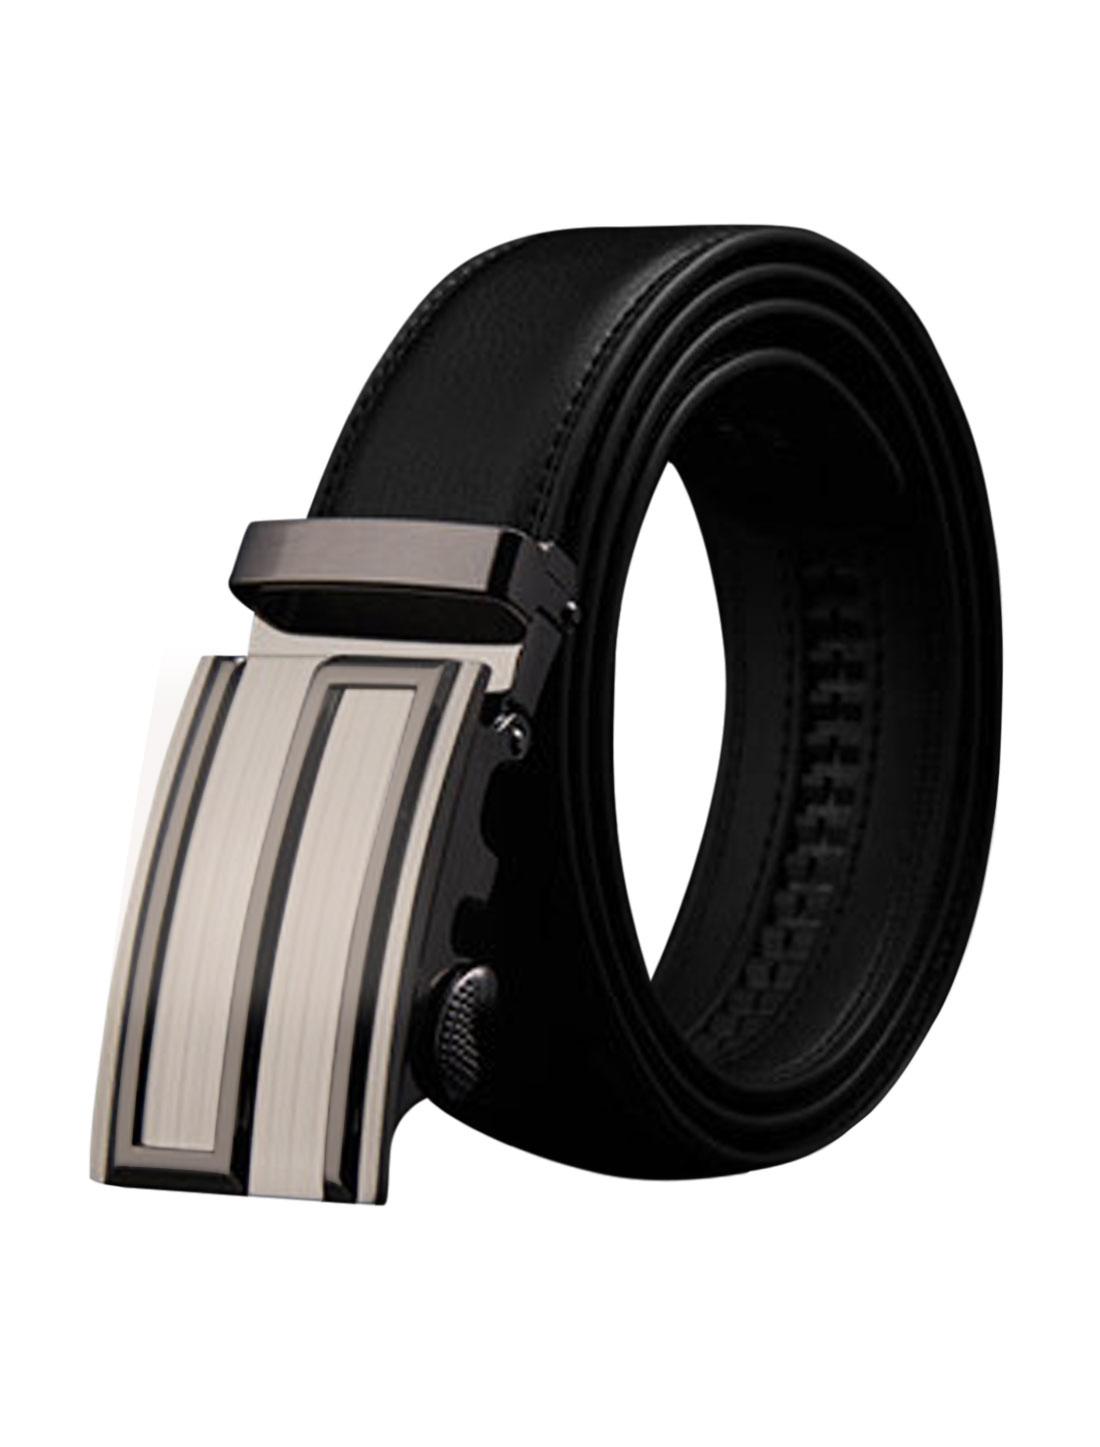 Man Automatic Buckle Holeless Stitched PU Ratchet Belt Black 120CM